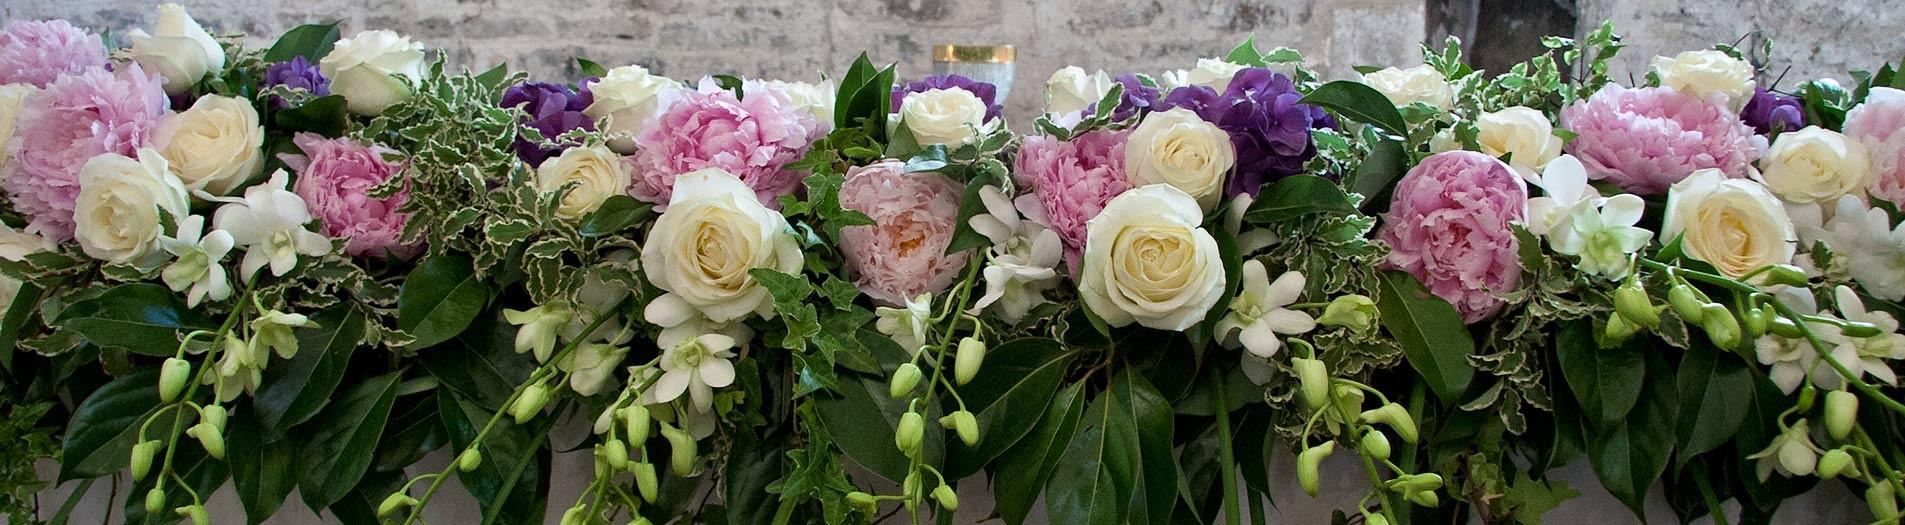 Matrimonio archives la piccola selva floral designer for Peonie periodo